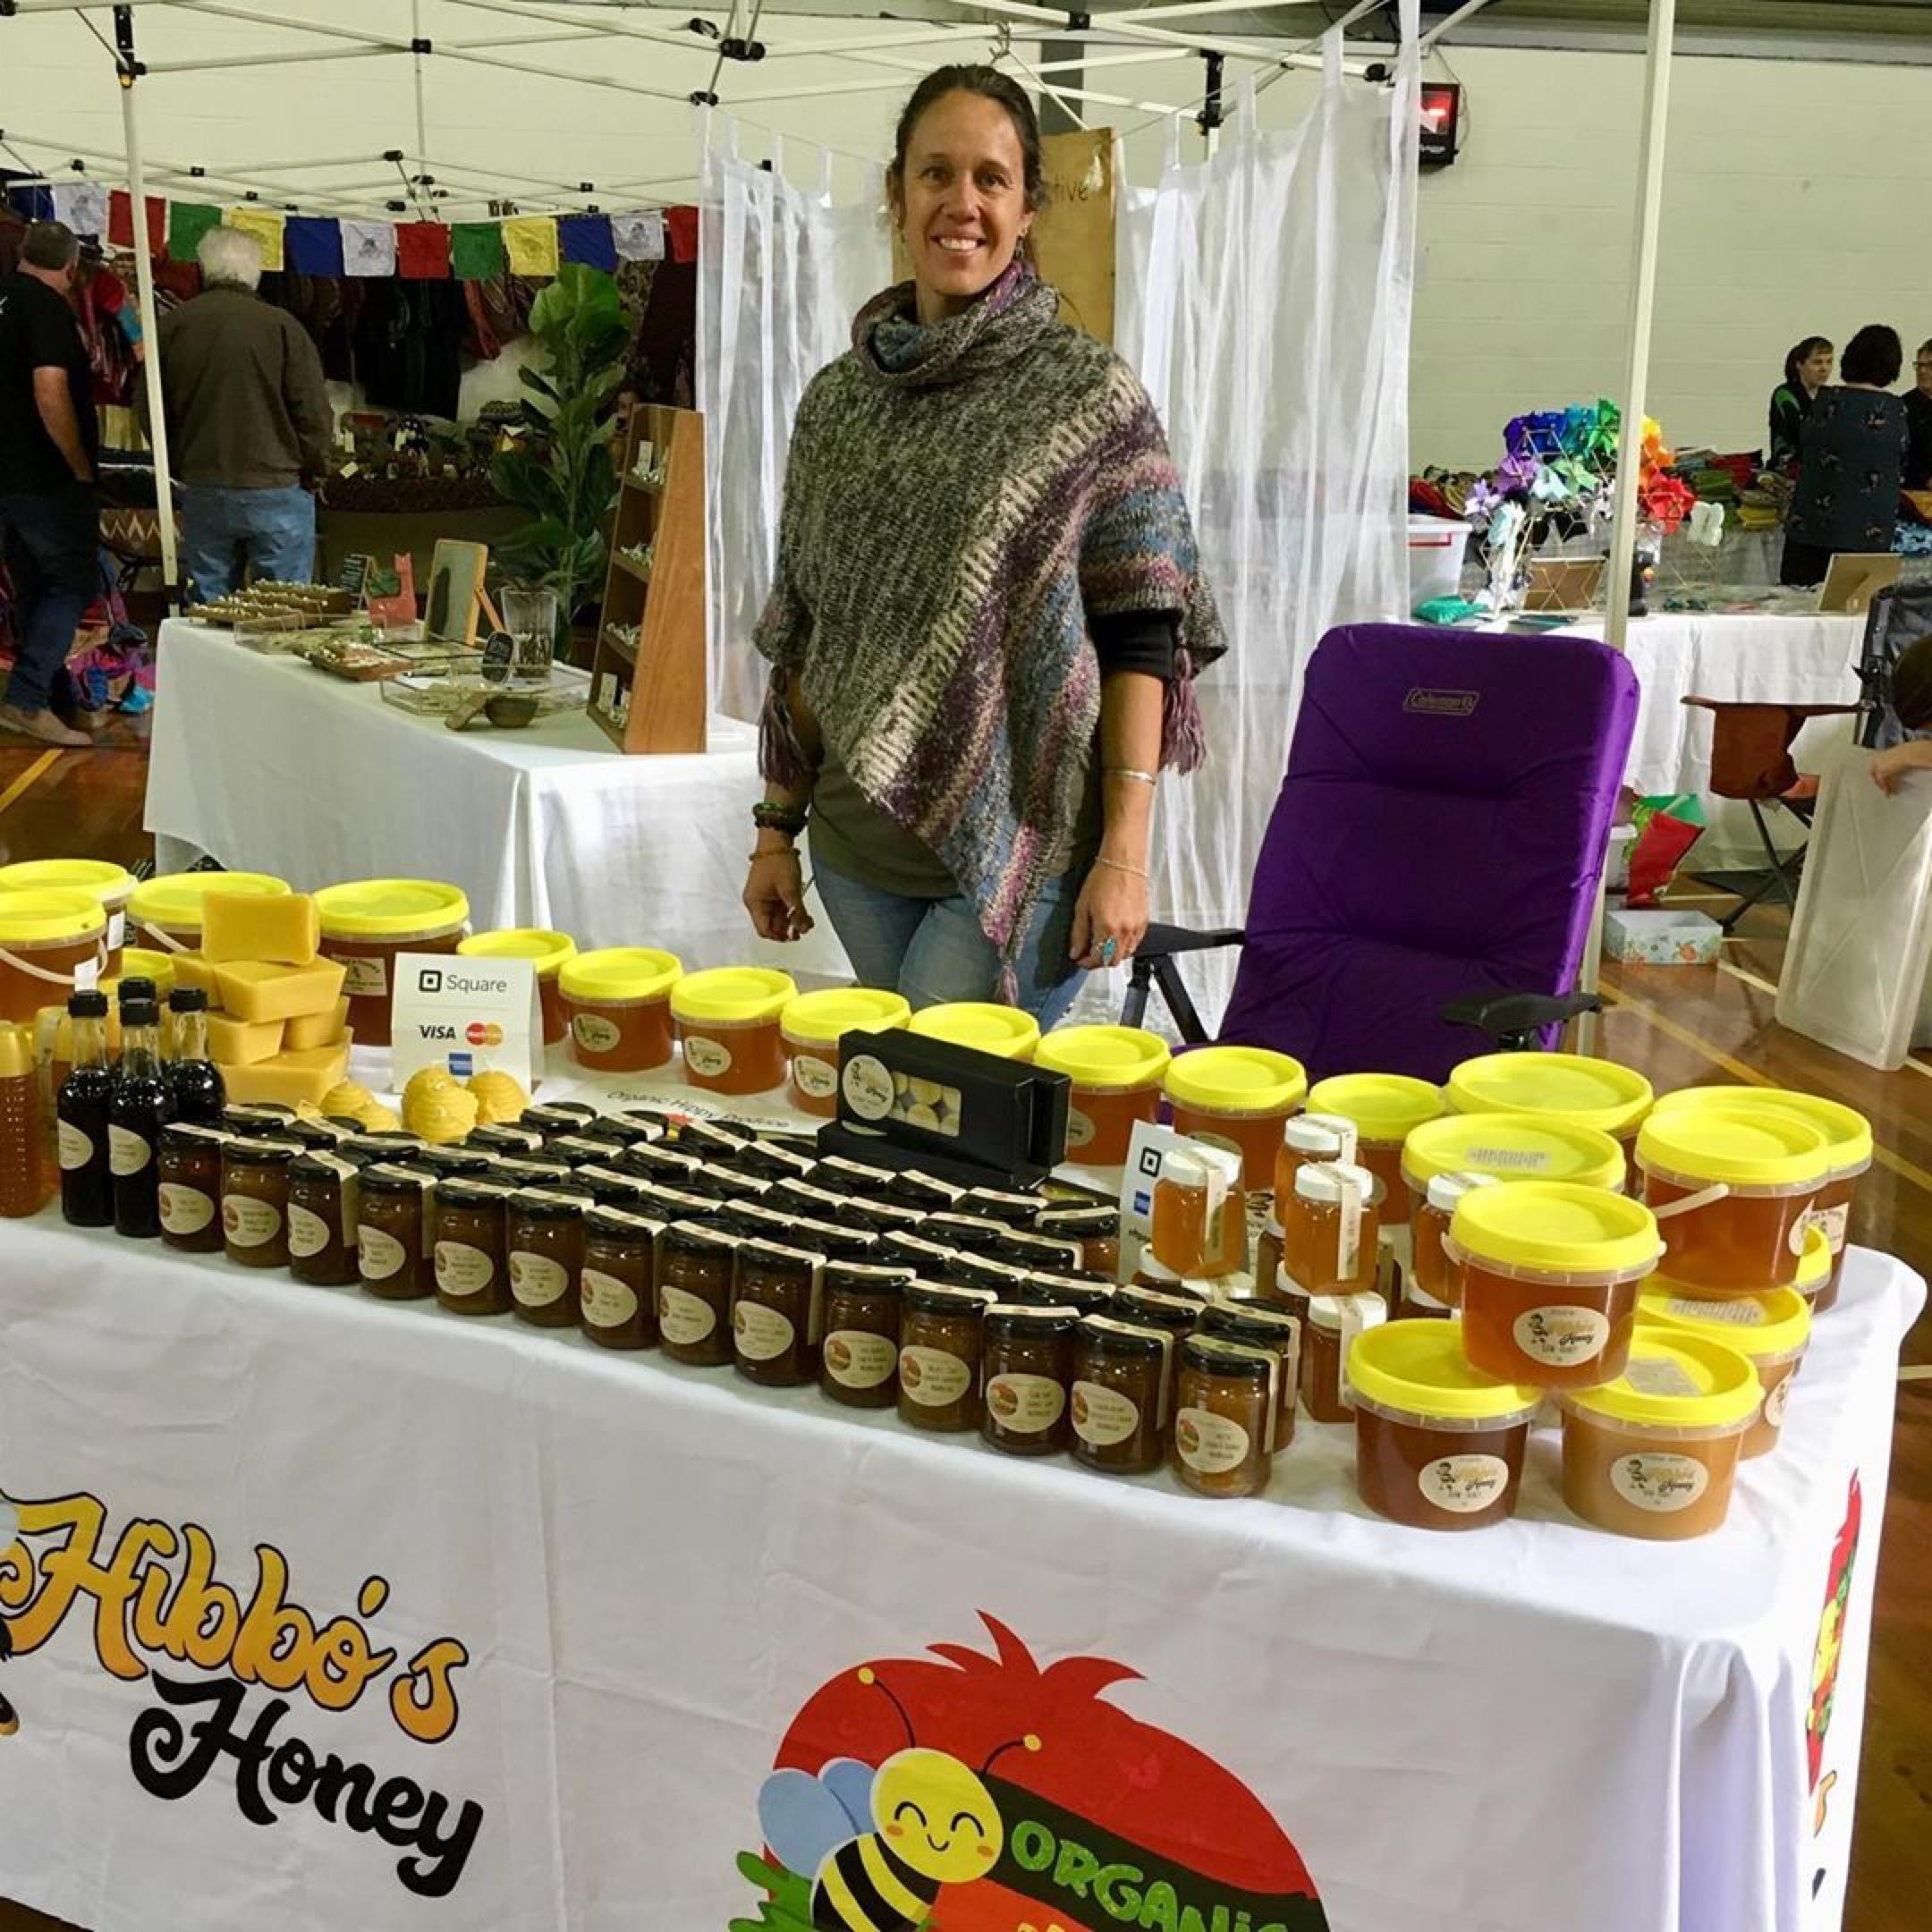 Hibbo's Honey -